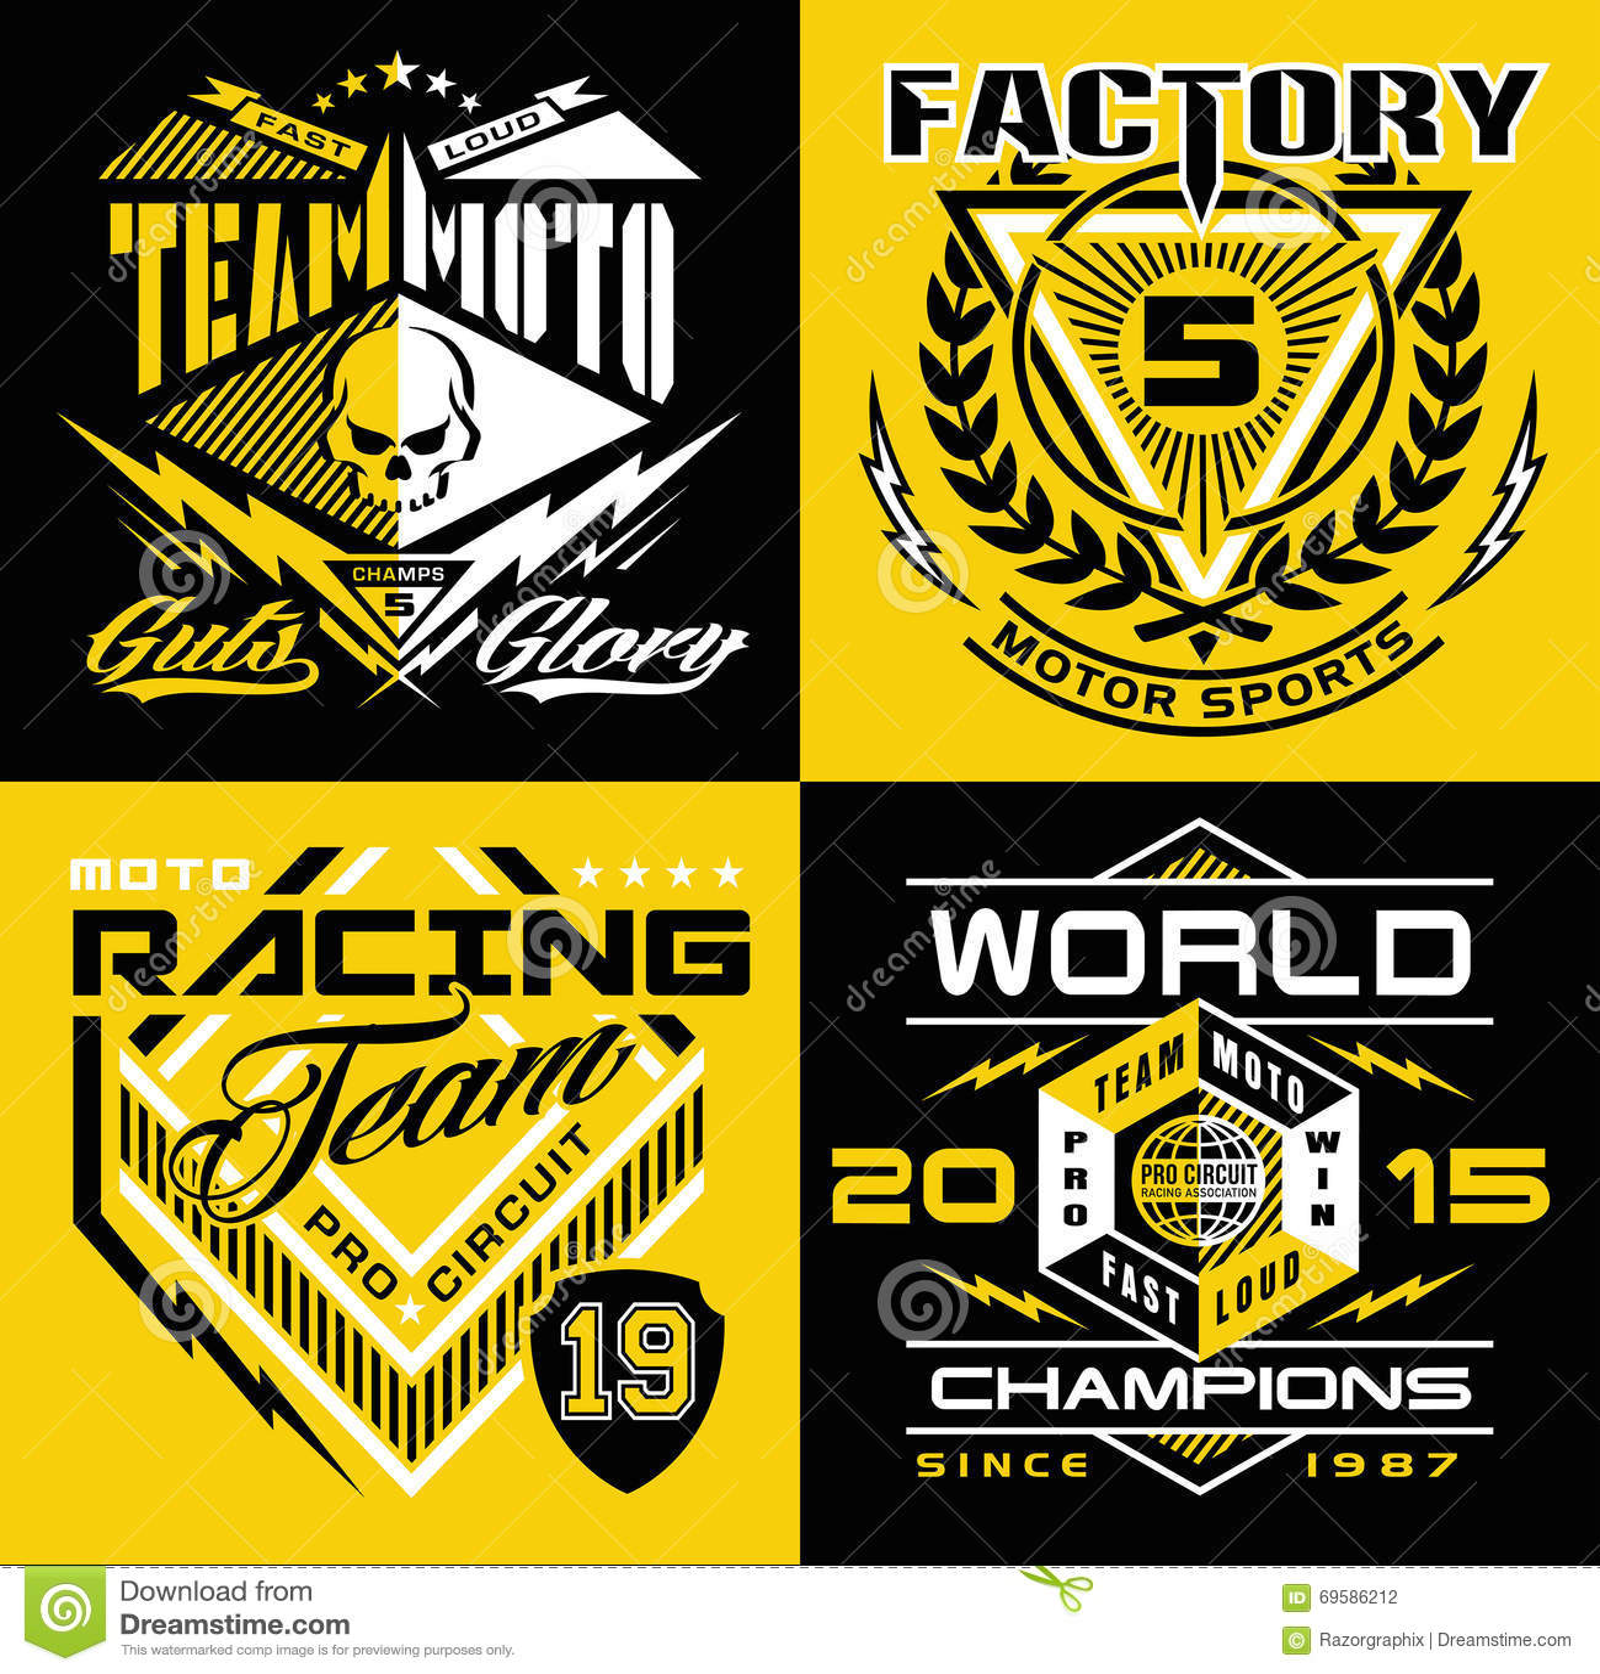 Motocross shield shirt